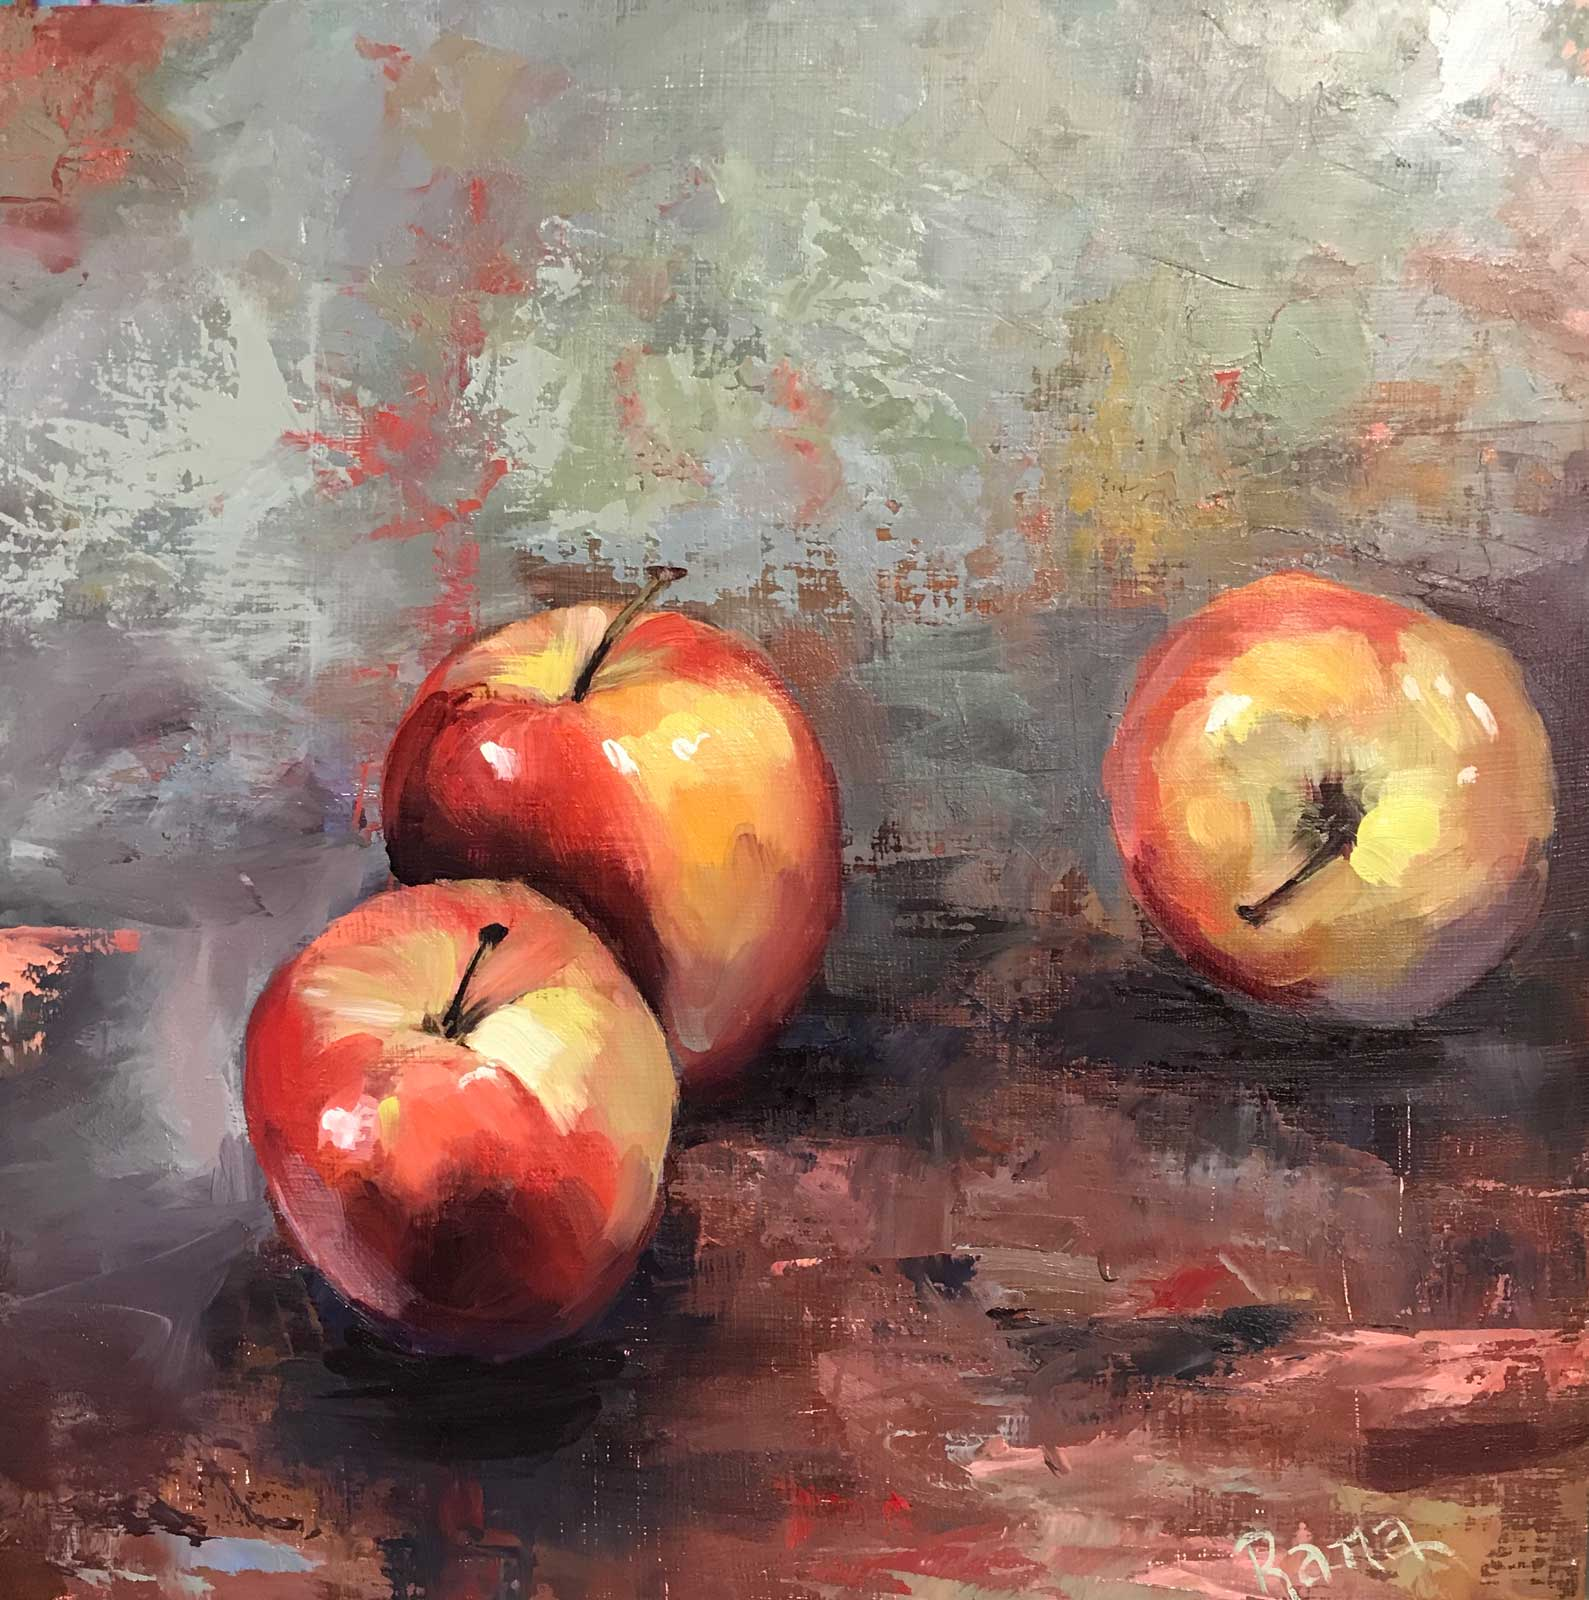 Rana Jordahl, The Apples of My Eyes, 12x12 Oil on board